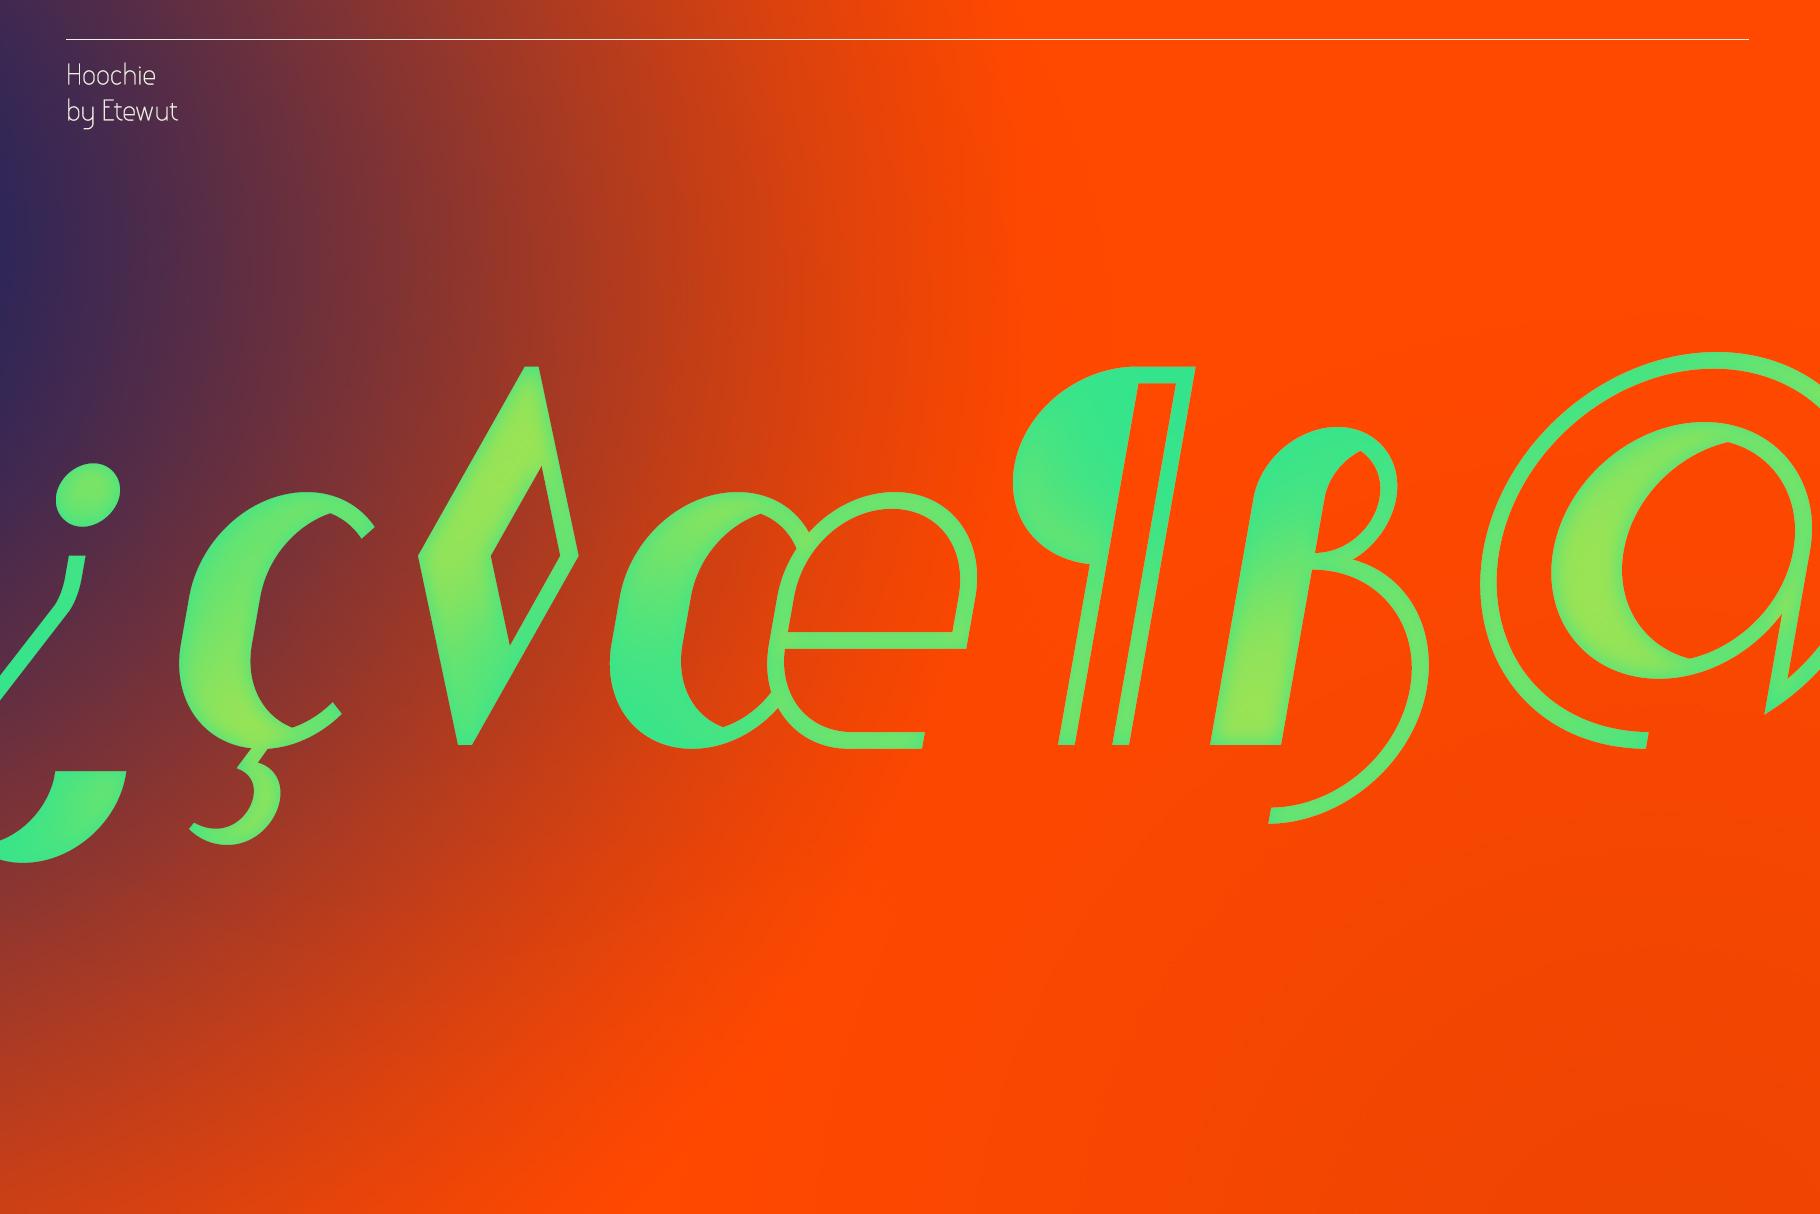 Hoochie example image 6